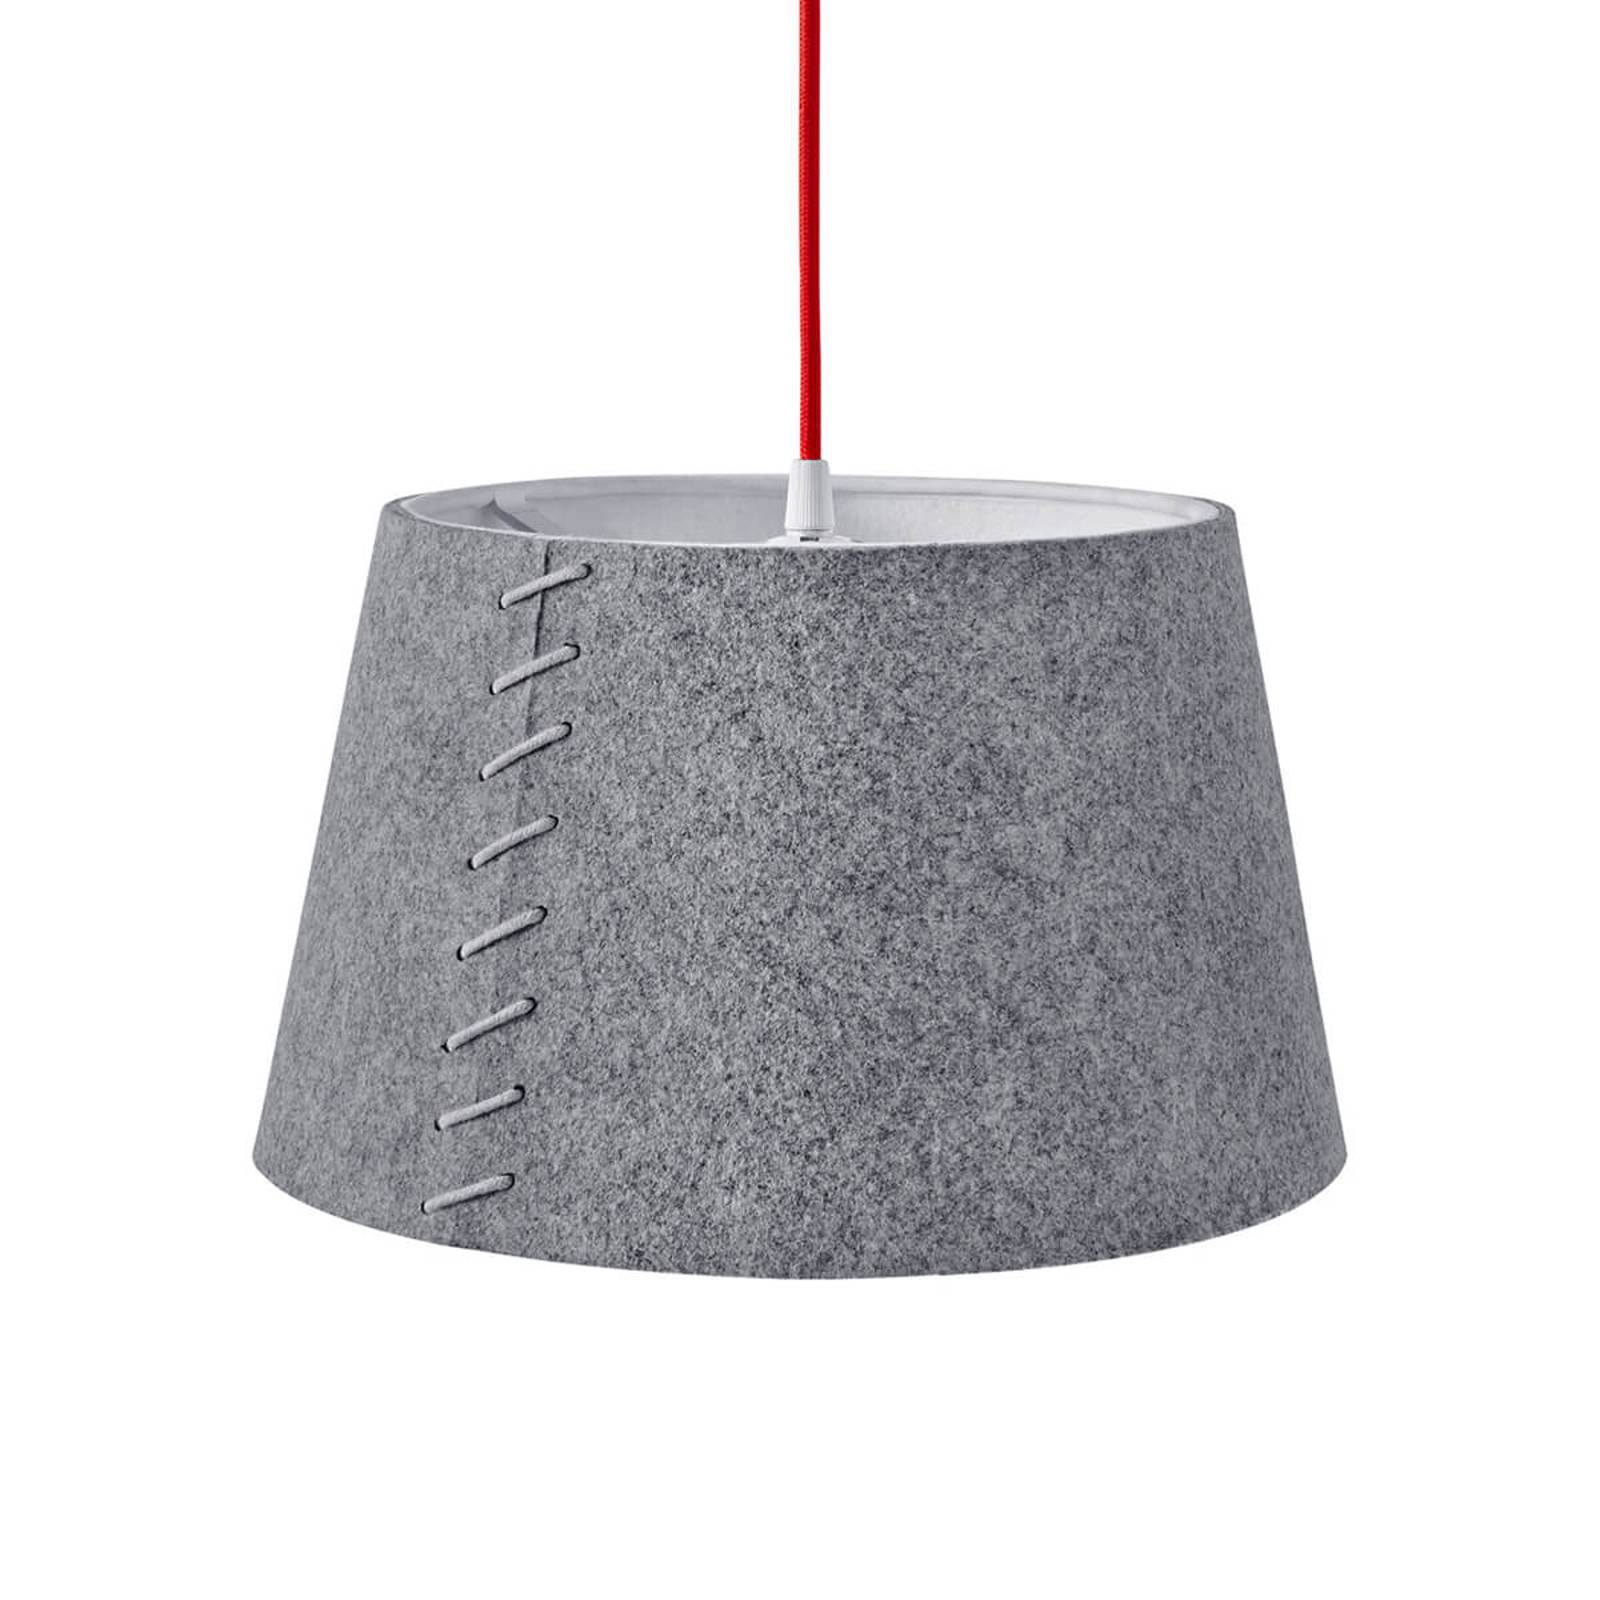 Alice-LED-riippuvalo harmaata huopakangasta, 30 cm